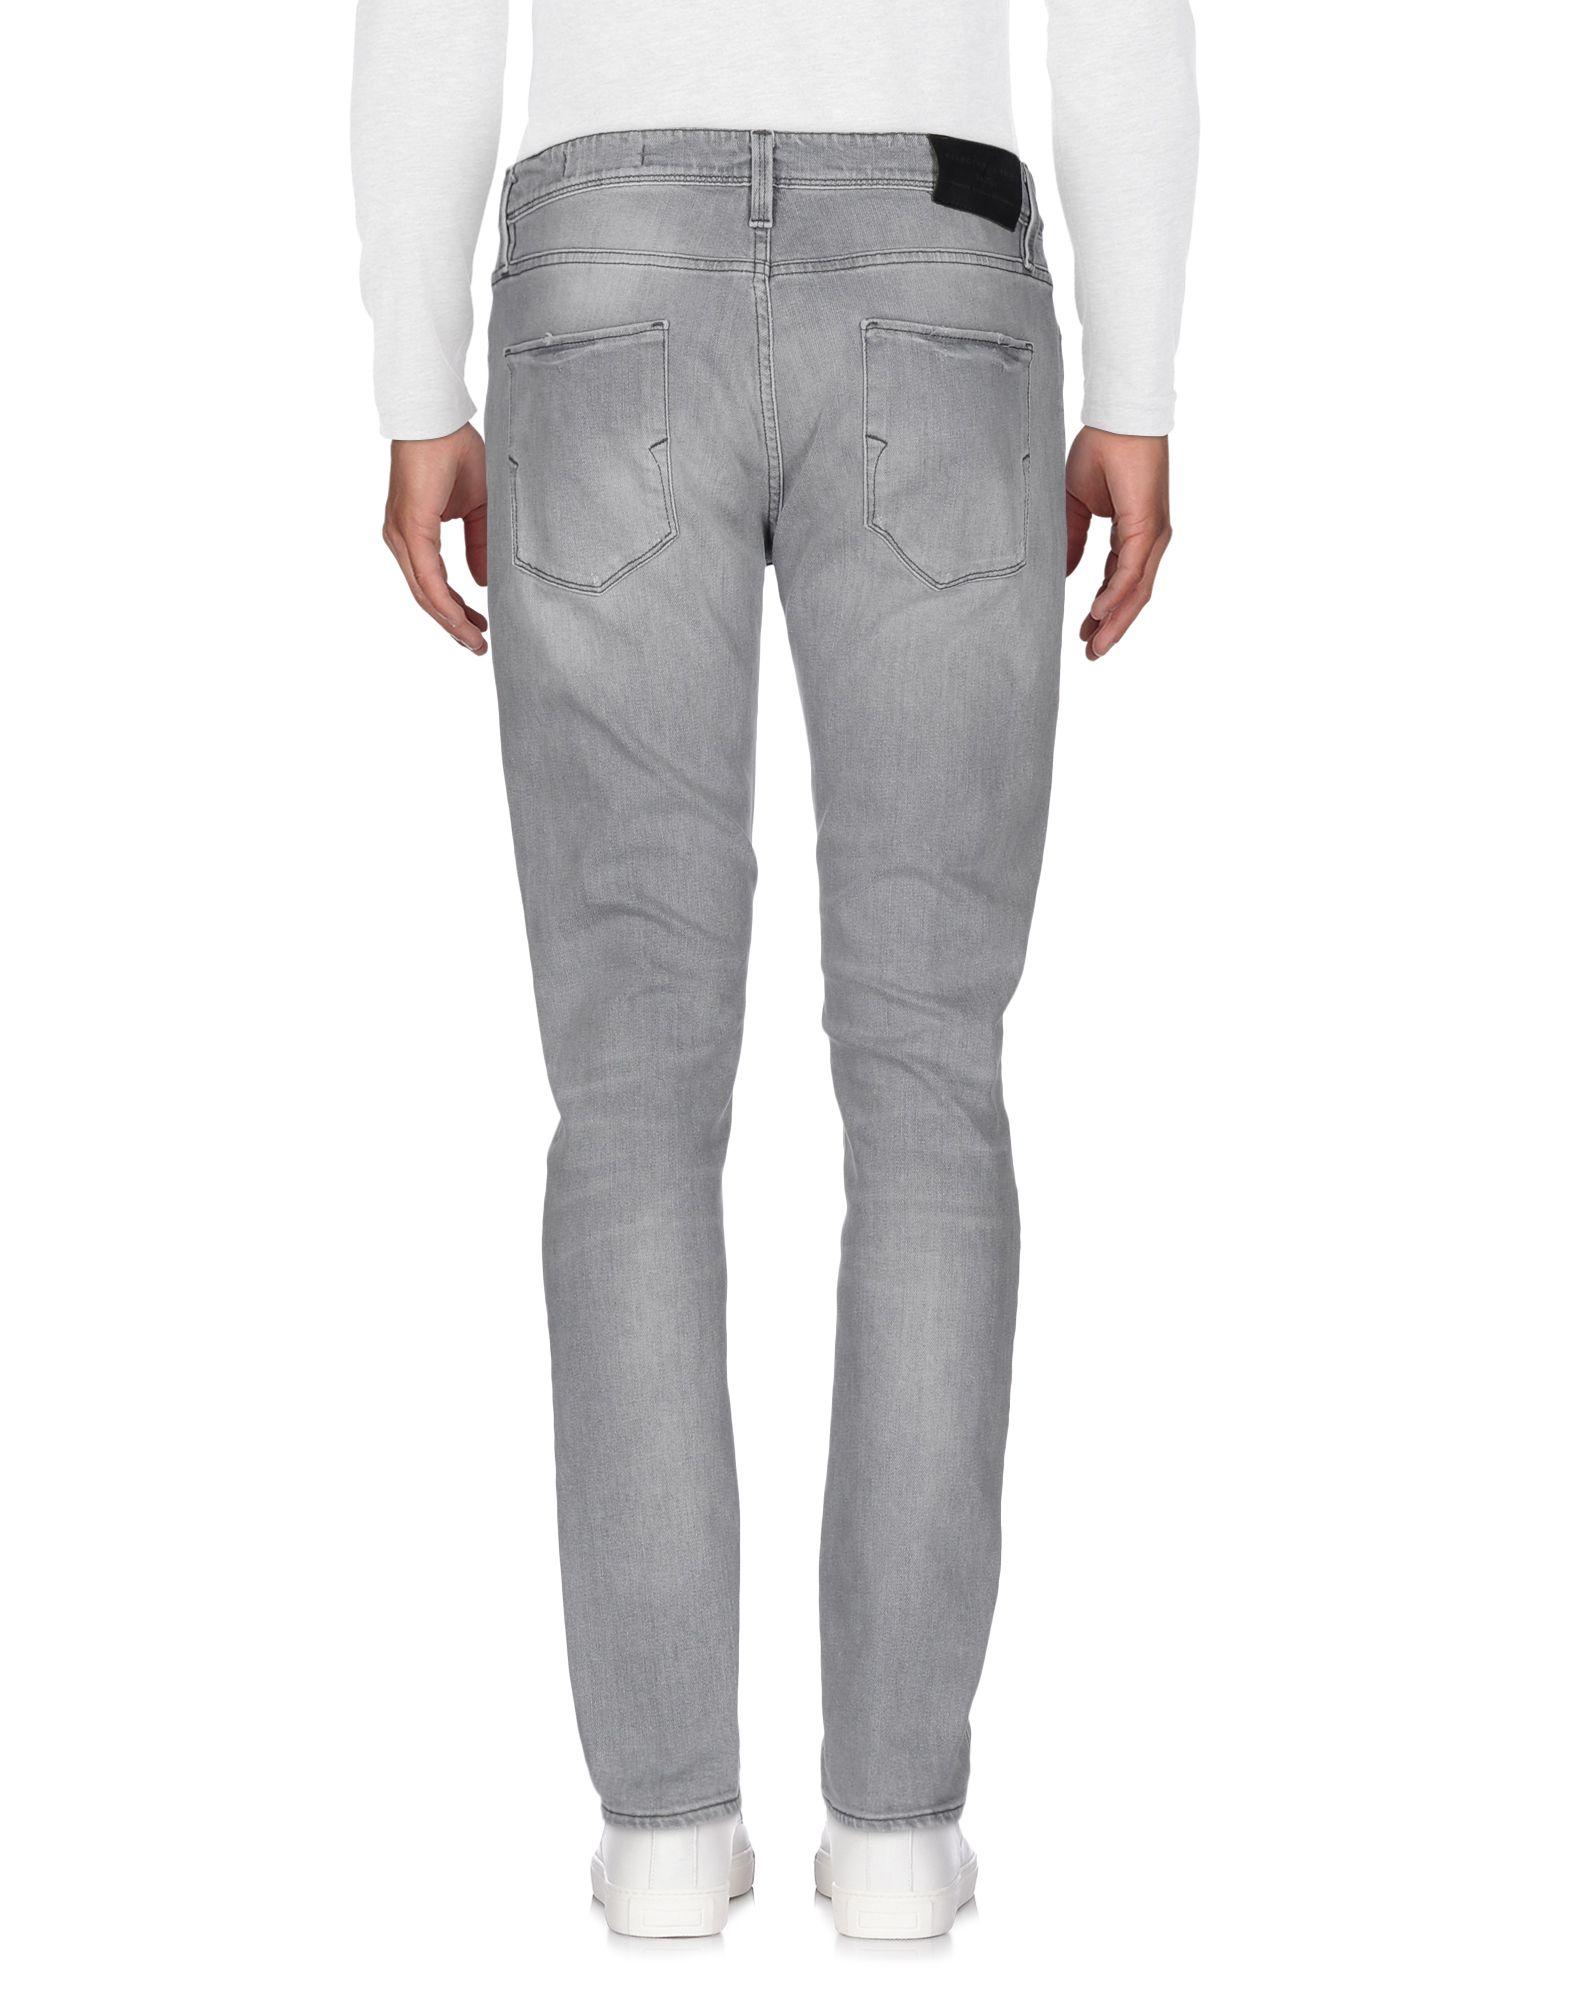 Pantaloni Jeans - Selected Homme Uomo - Jeans 42579923PJ 85f6f1